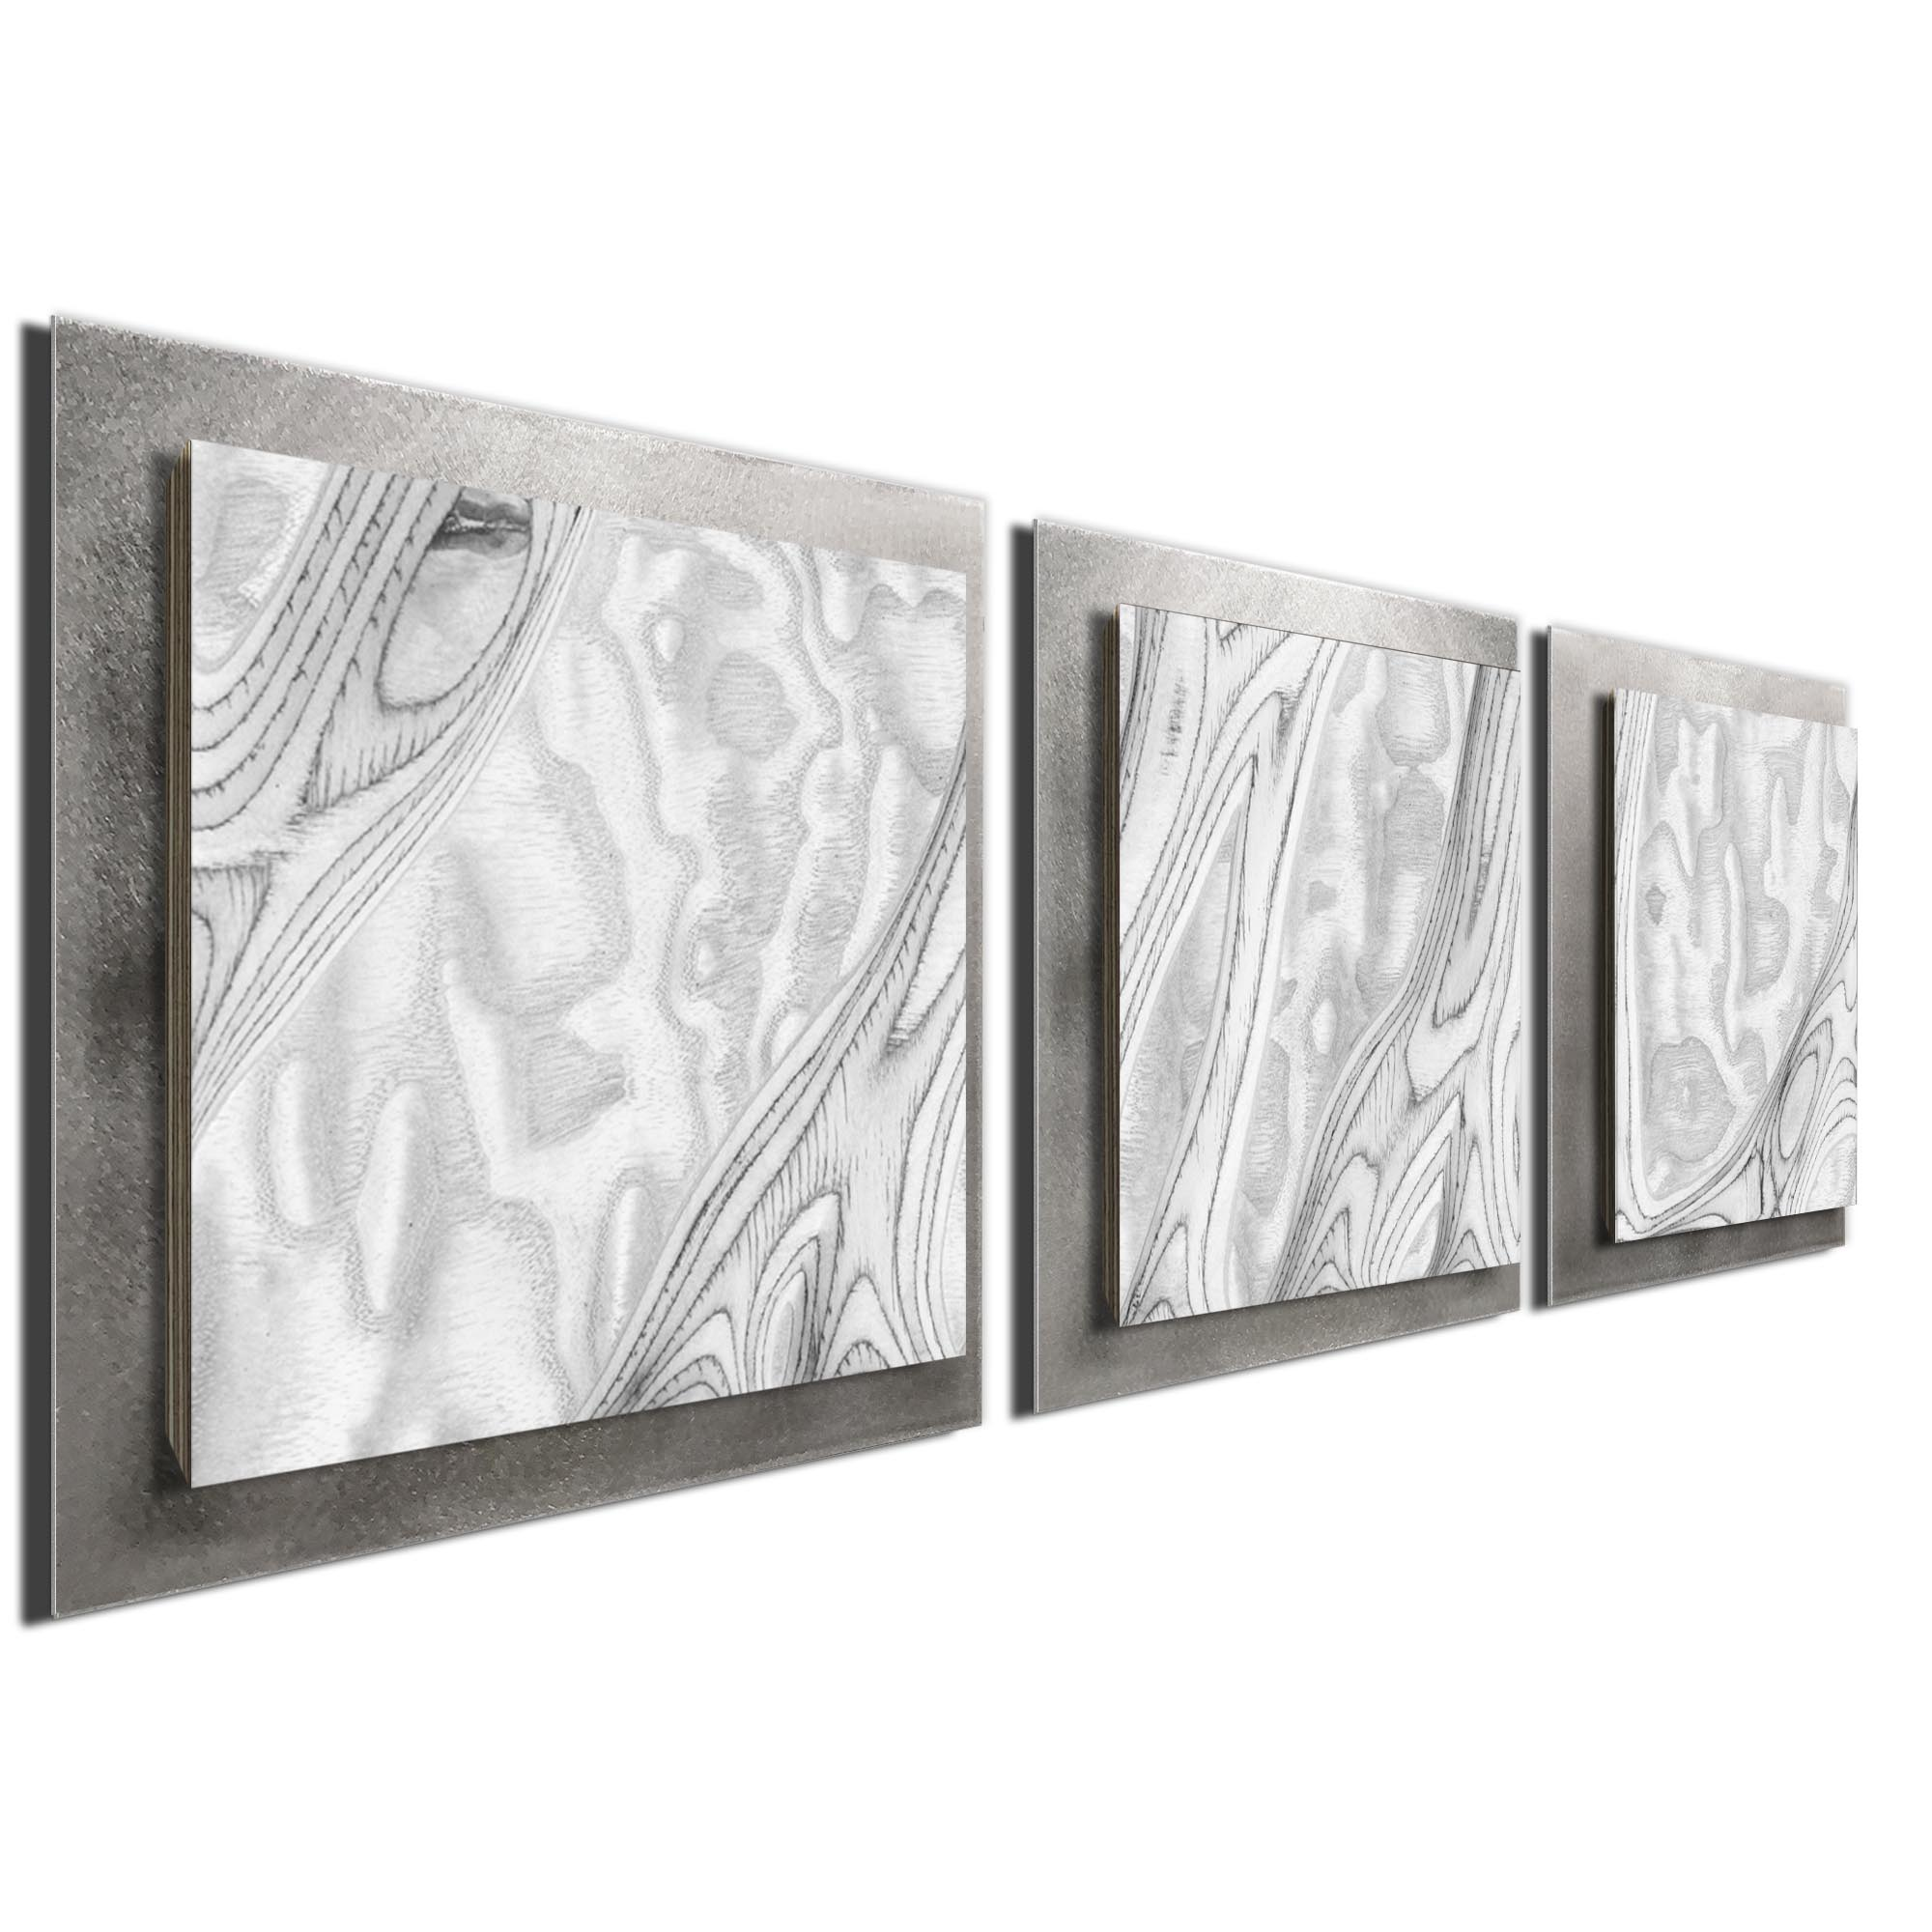 Whitewash Burl Essence Silver by Jackson Wright Rustic Modern Style Wood Wall Art - Image 2